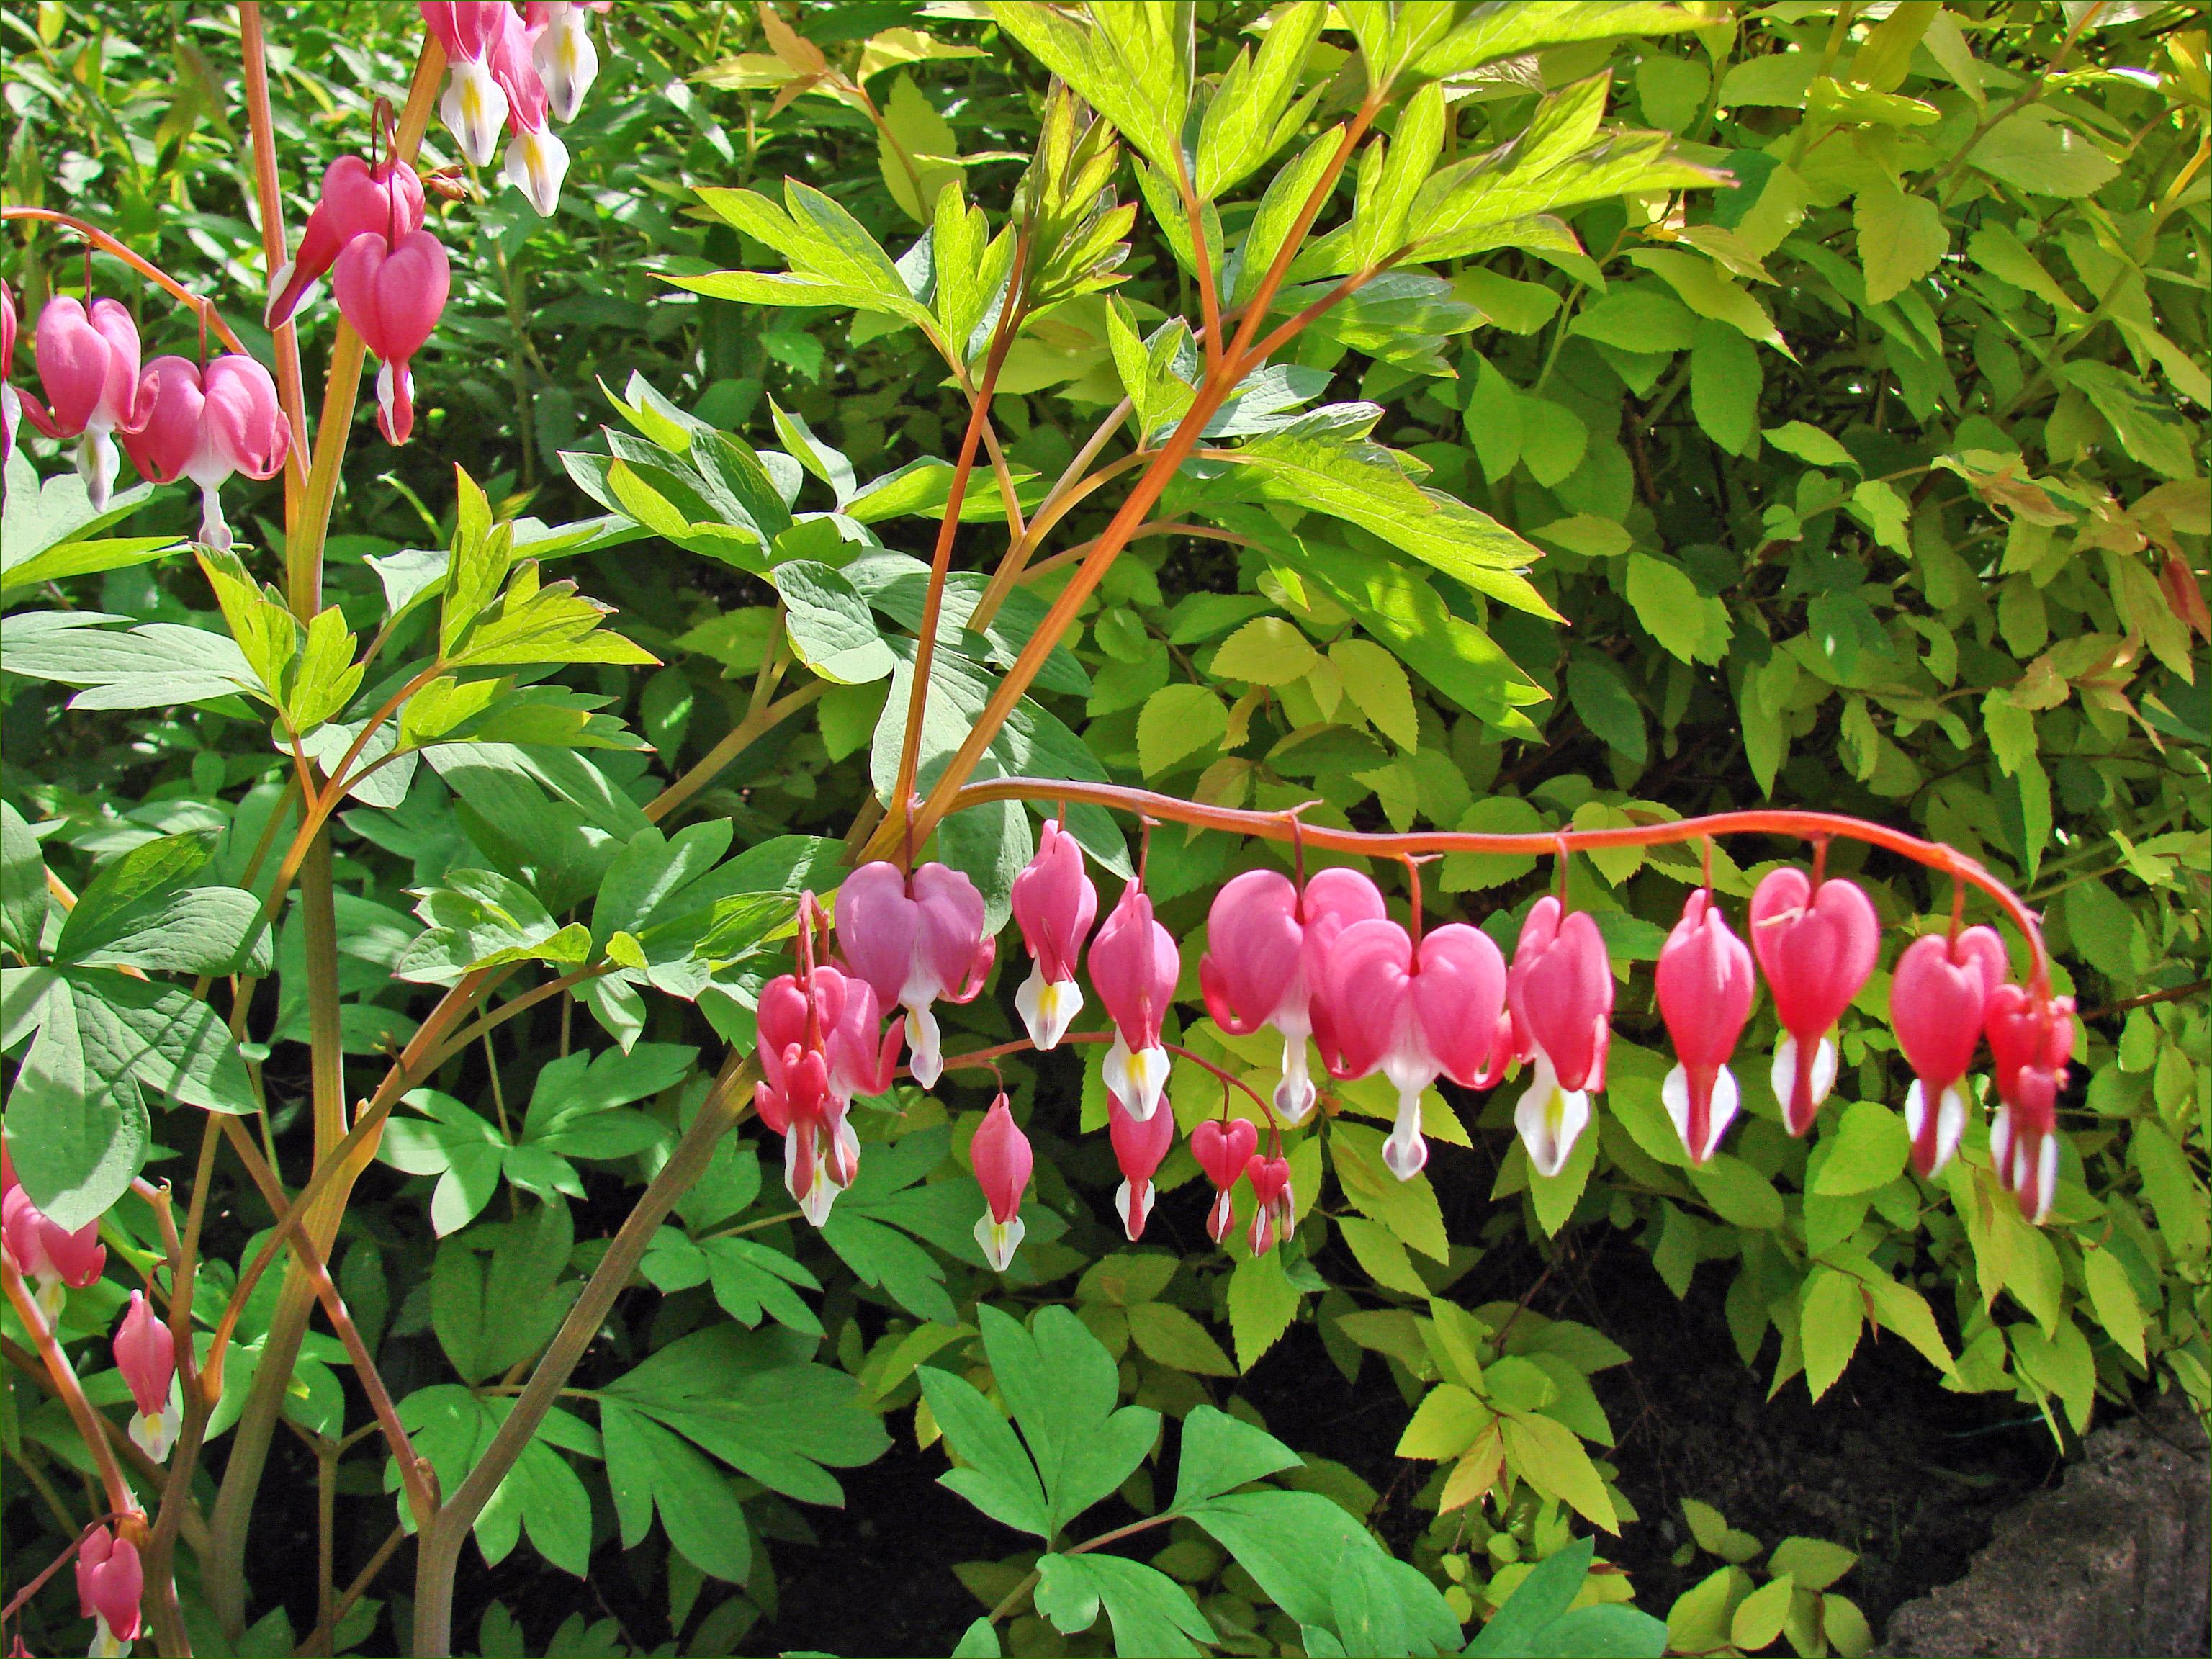 file fleurs de printemps coeur de marie 4544804133 jpg wikimedia commons. Black Bedroom Furniture Sets. Home Design Ideas